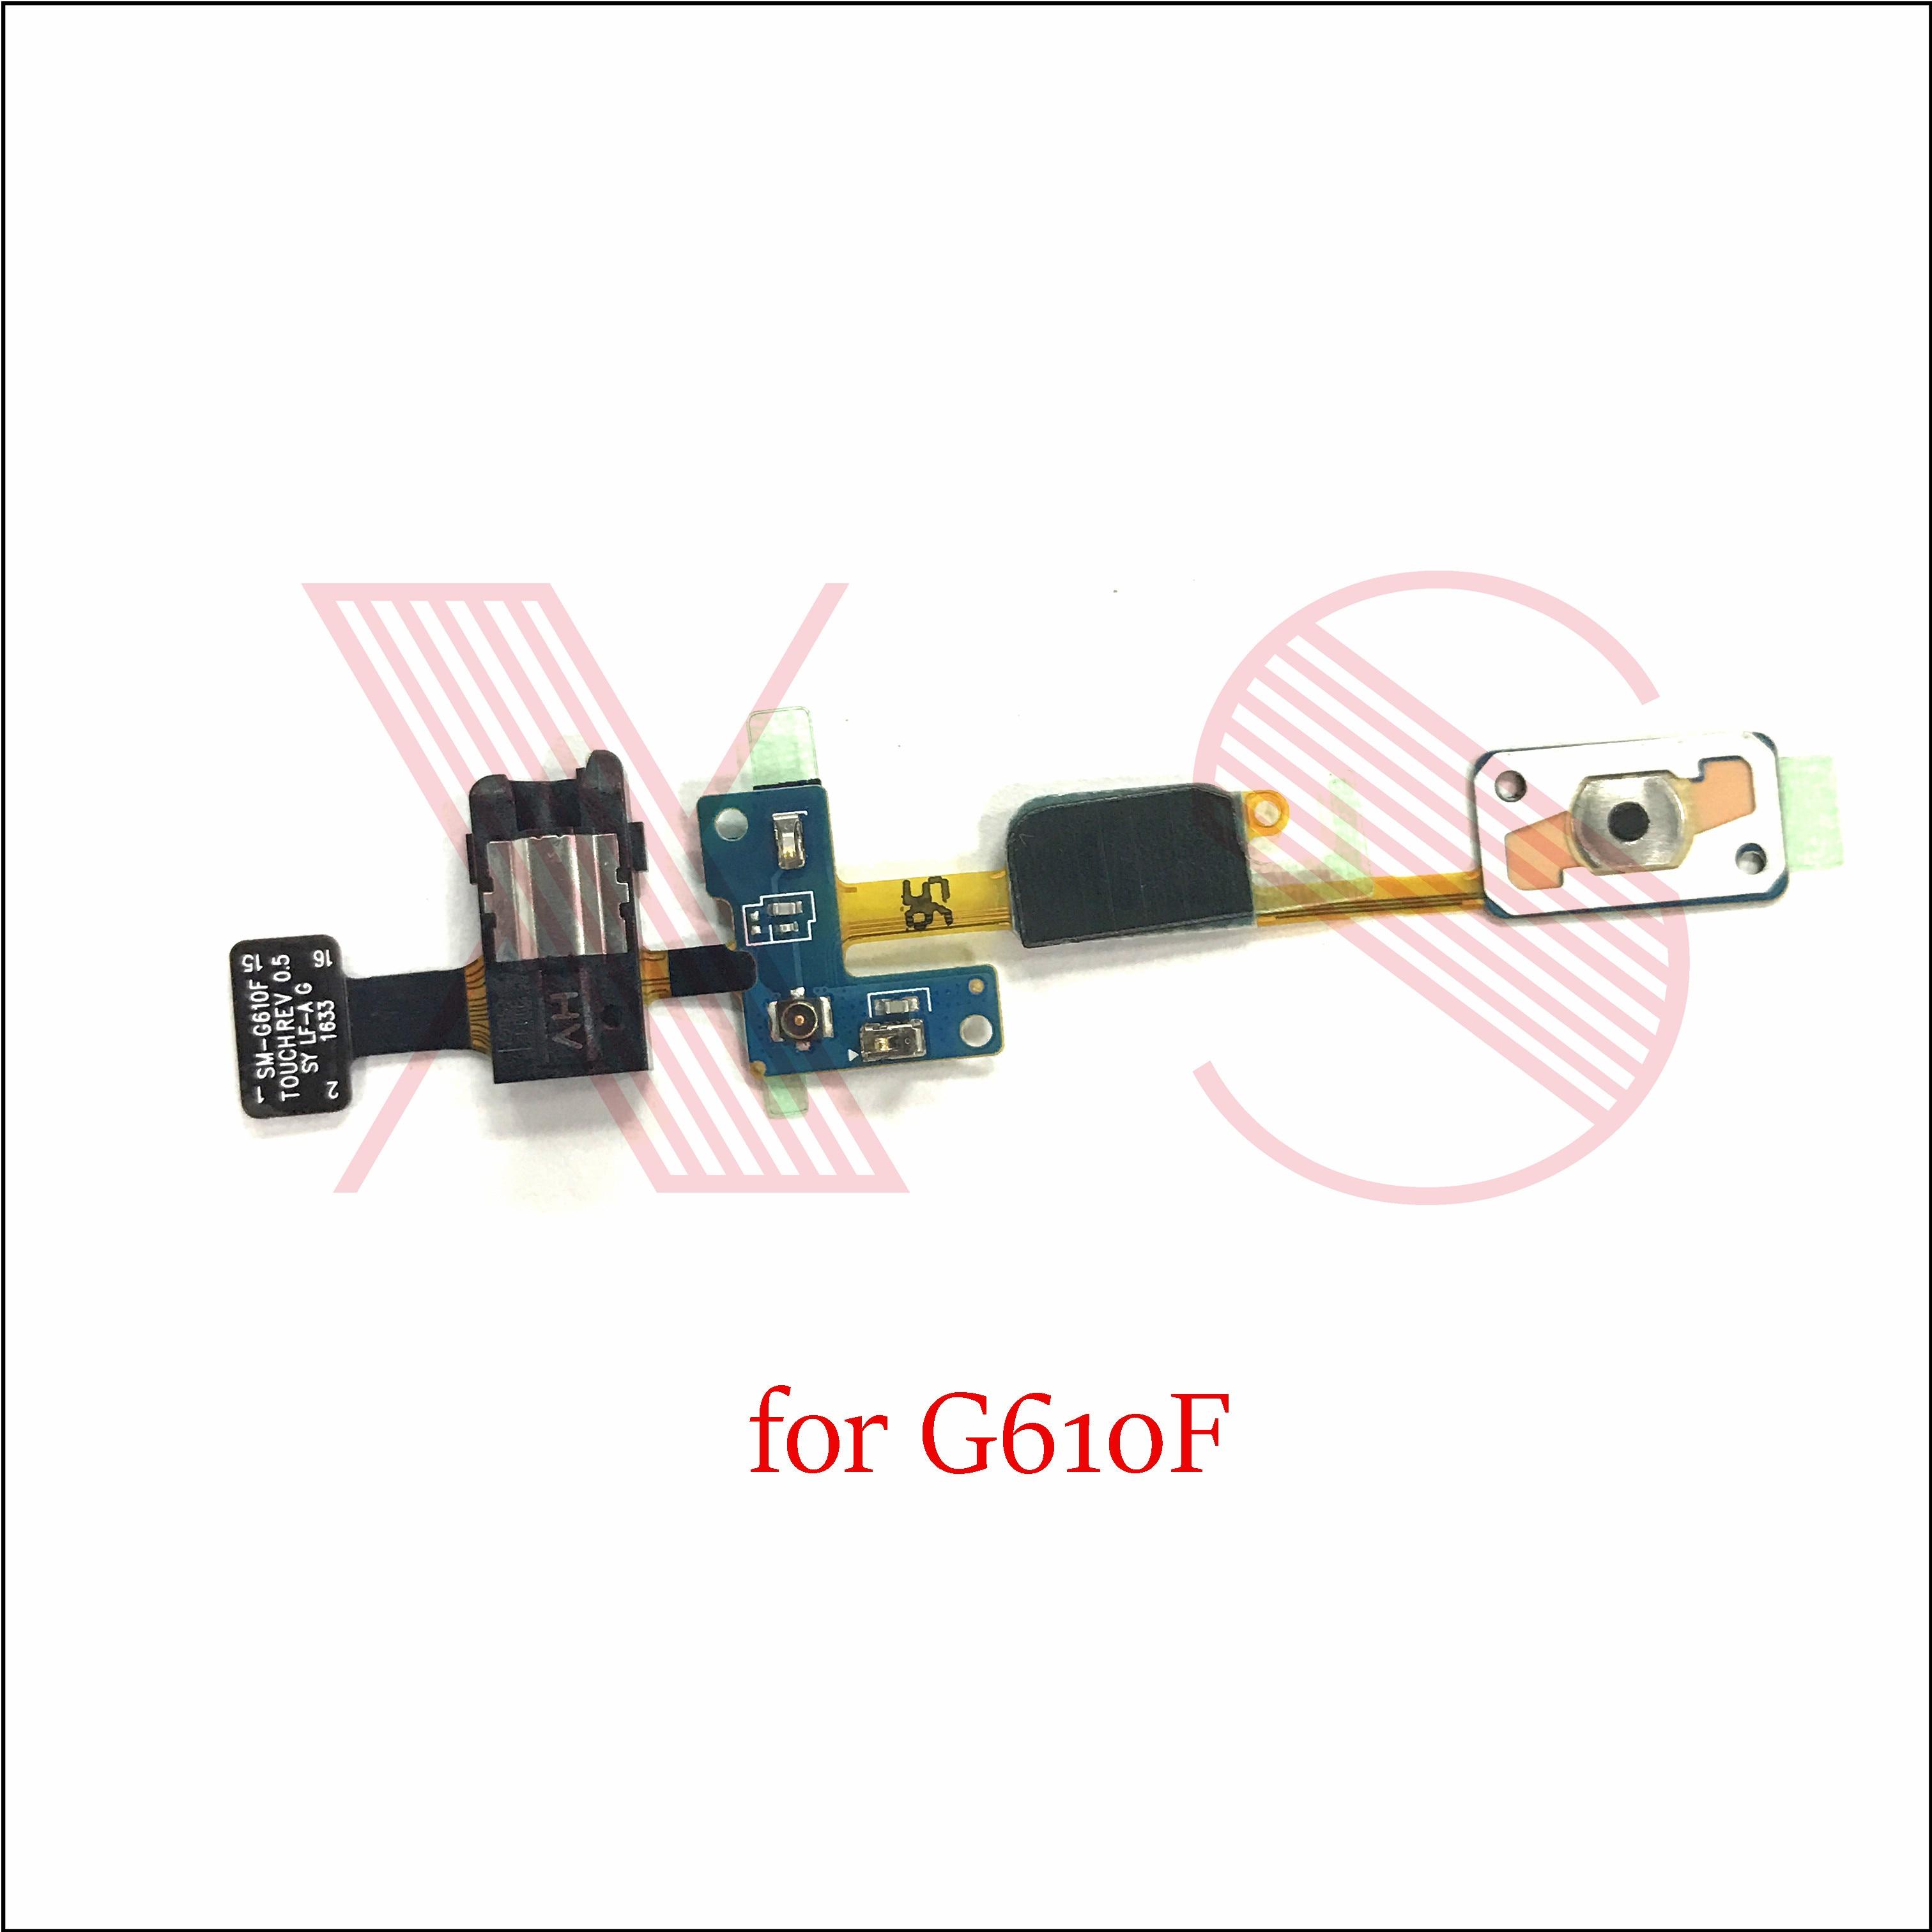 50x For Samsung Galaxy J7 Prime G610F Home Button Key Return Light Sensor Menu Keyborad Headphone Audio Jack Flex Cable Flat